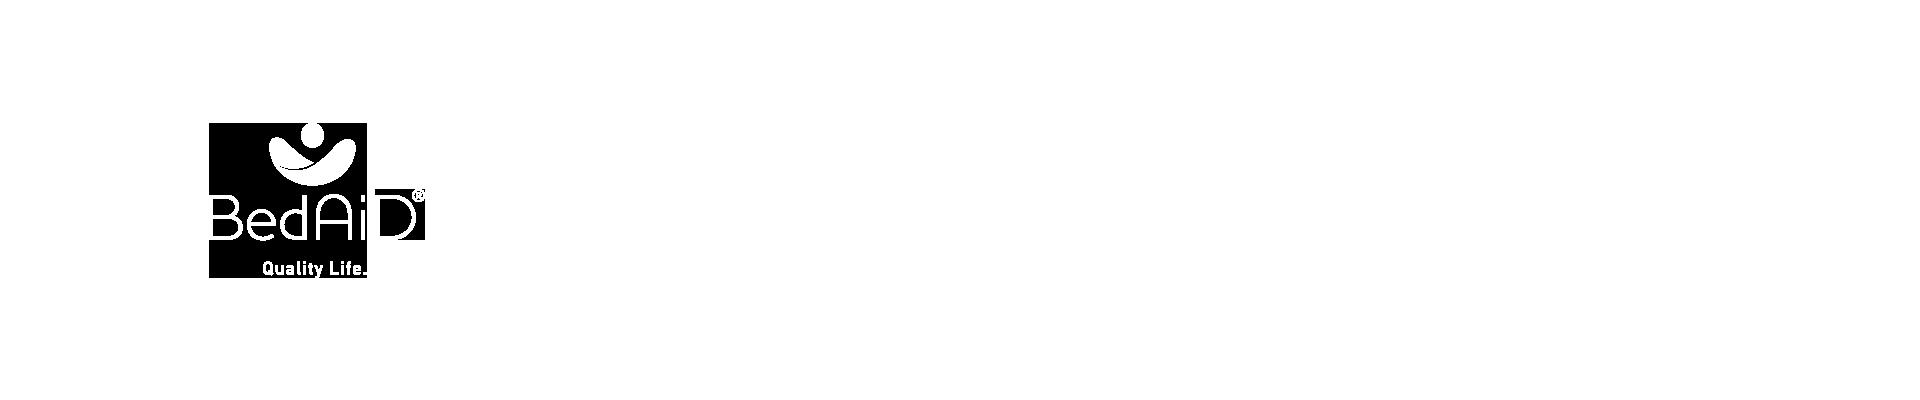 Banner Bedaid Tekerlekli Sandalye Minderi  Logo